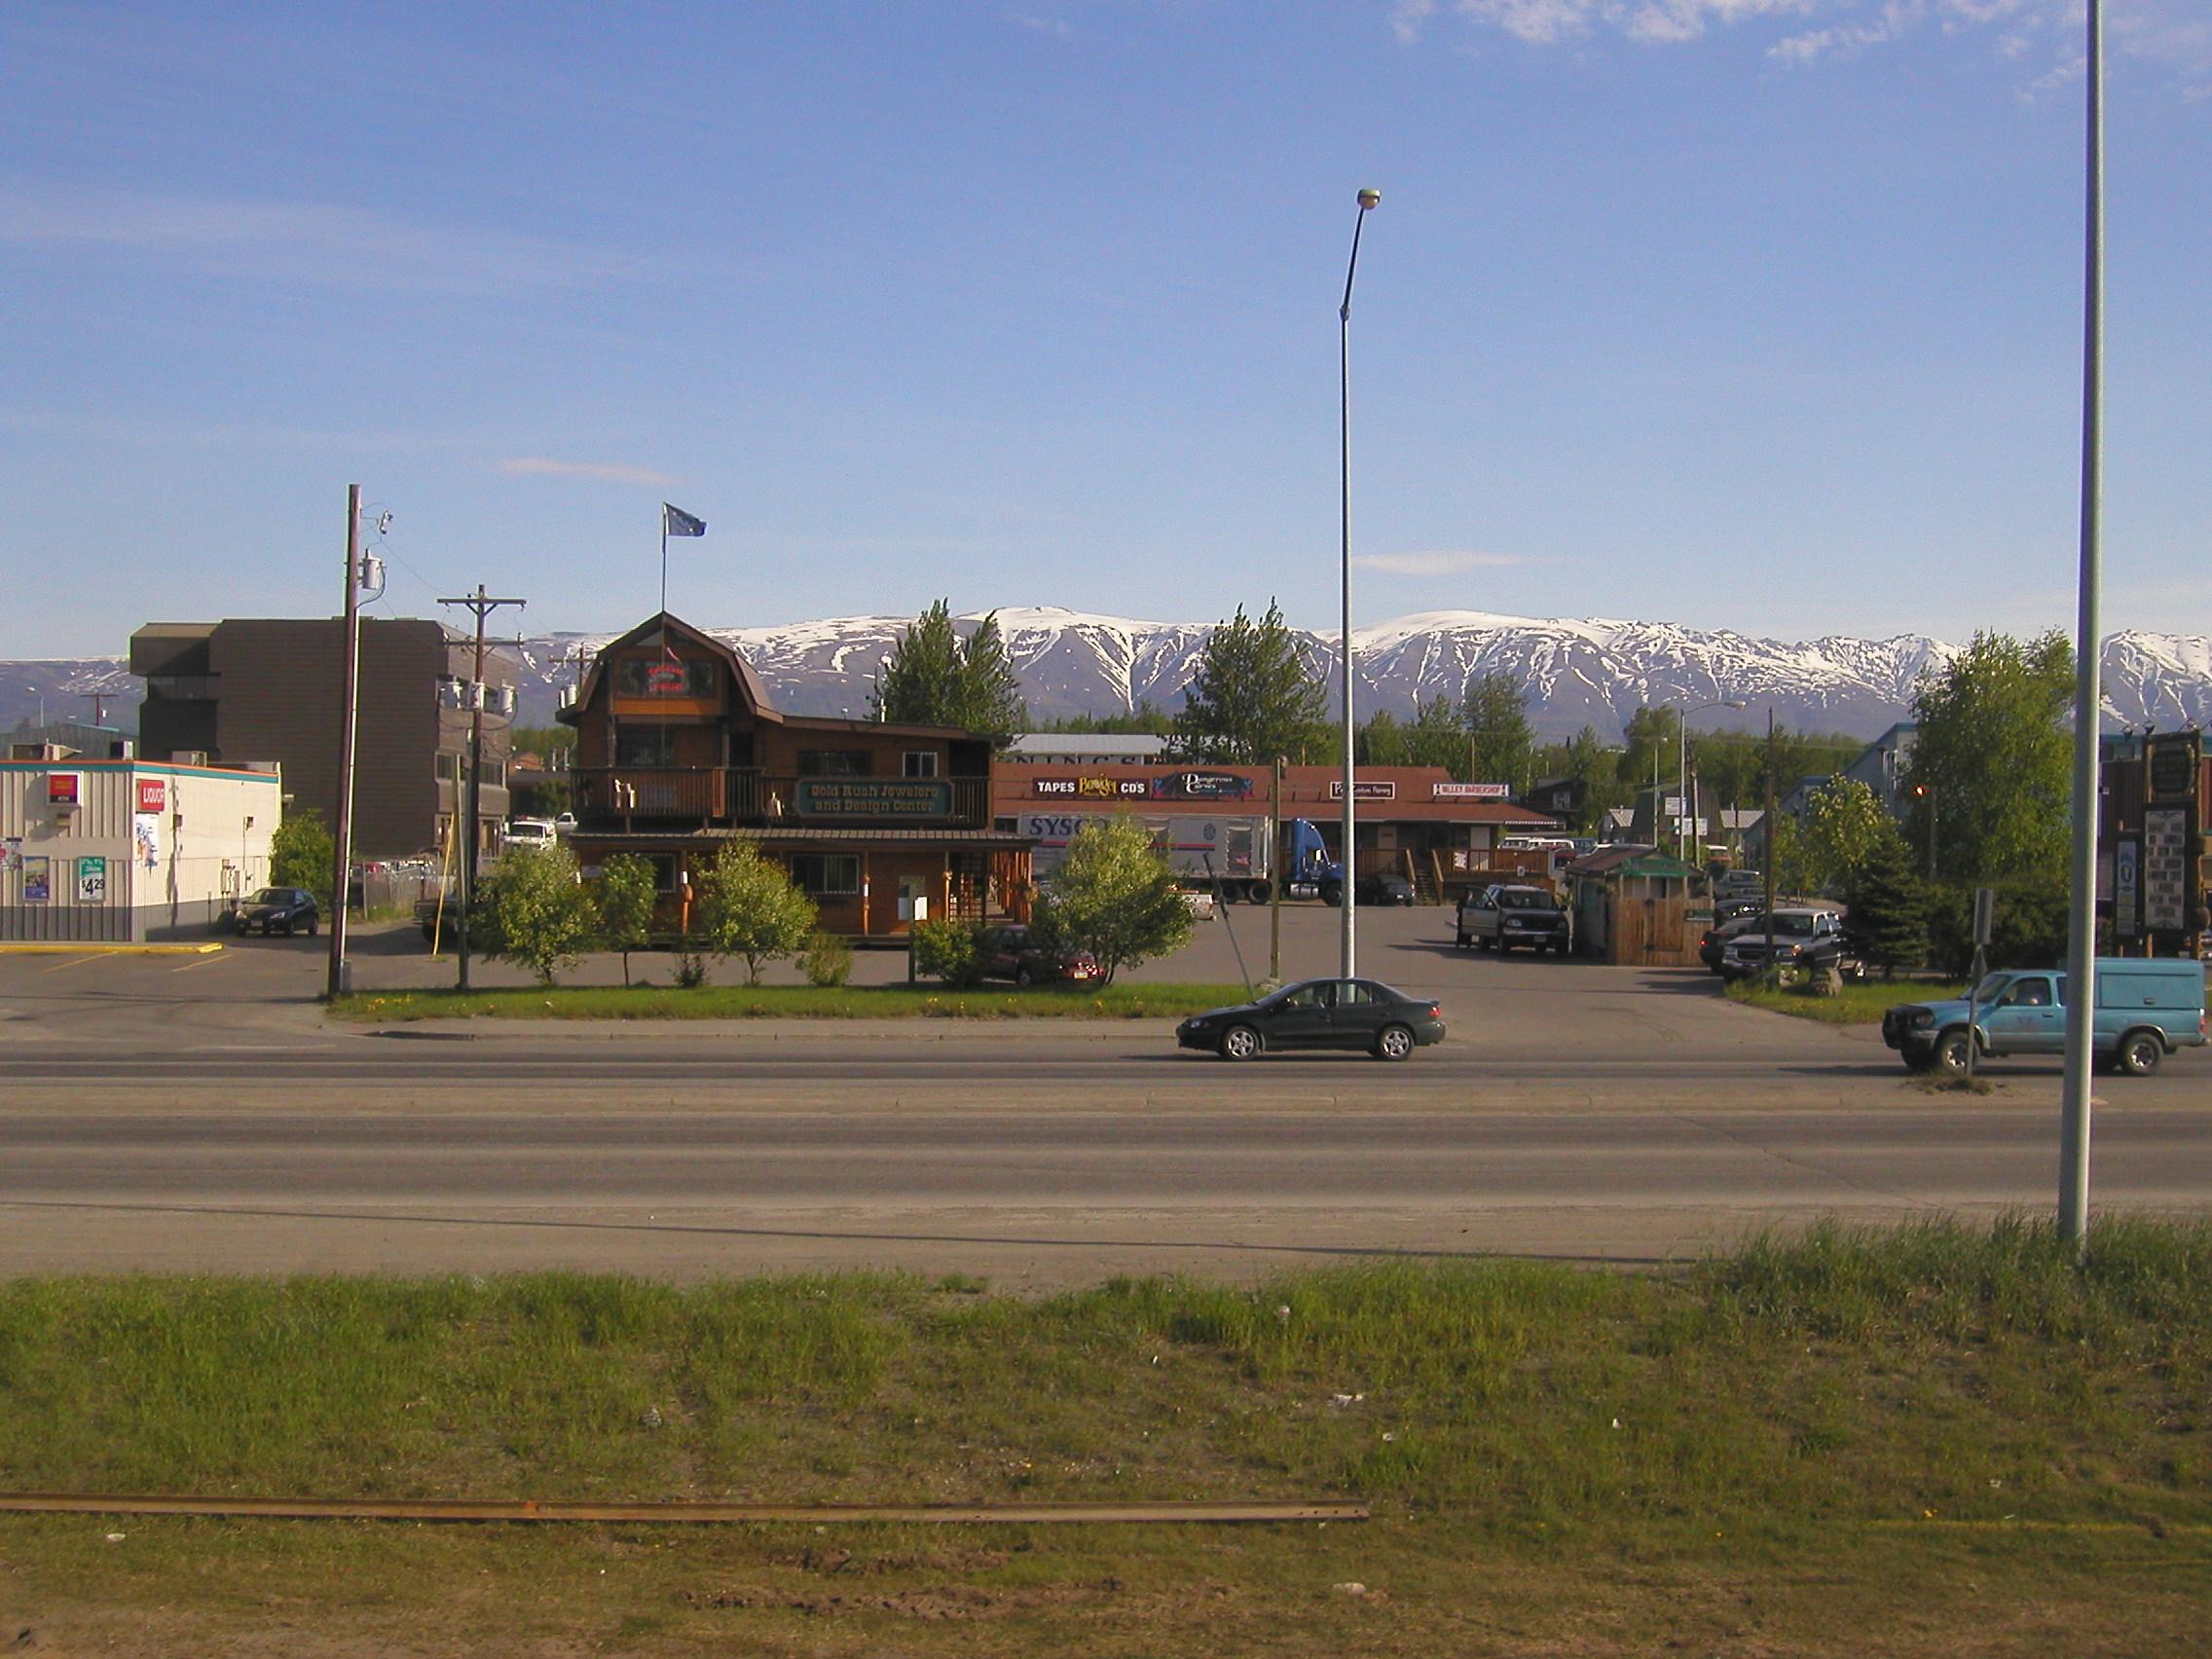 Strip Mall, Wasilla, Alaska (and Sysco truck)